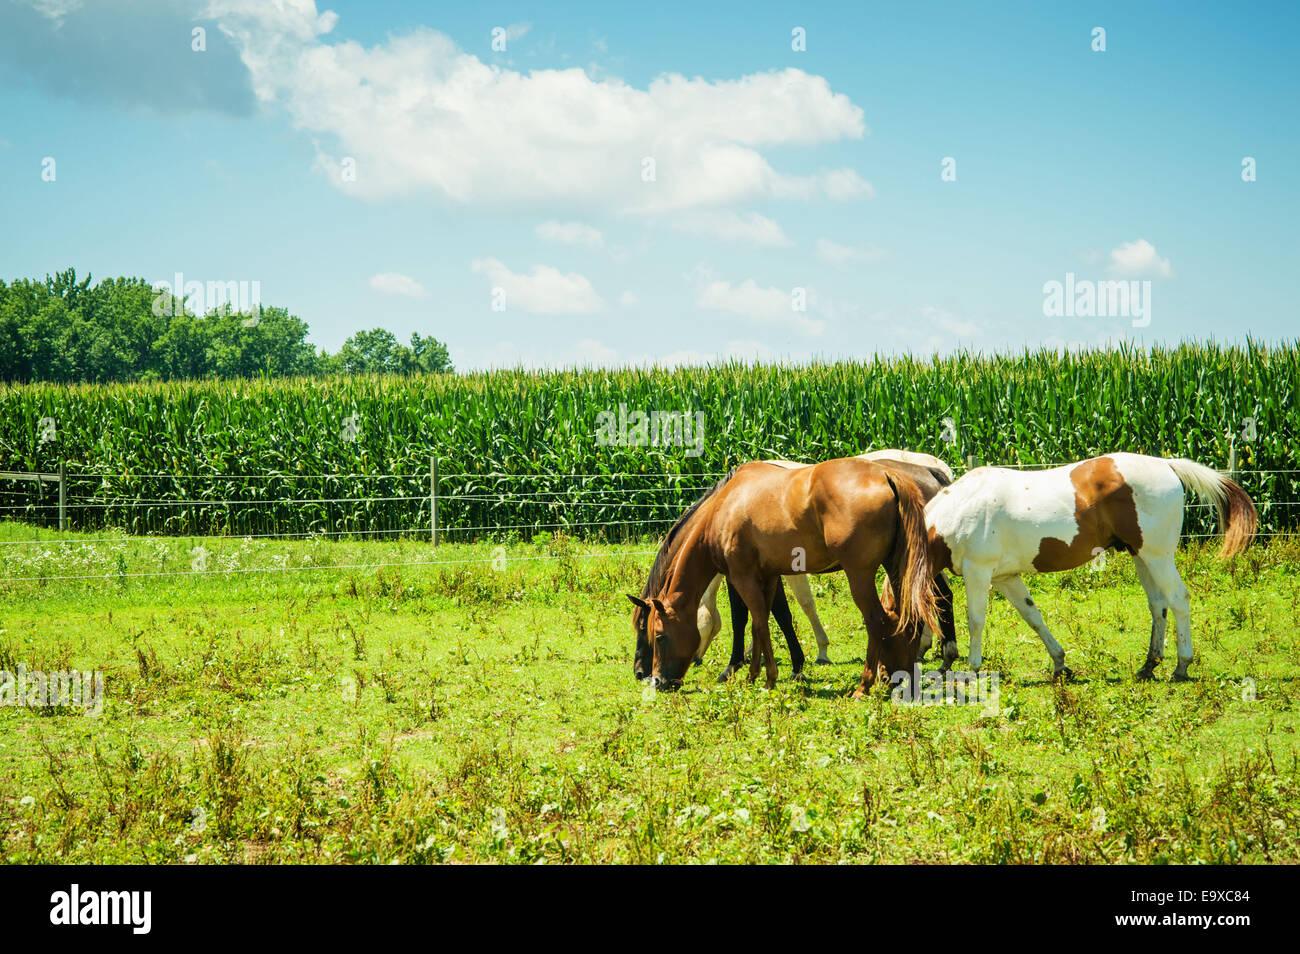 Caballos que pastan en una pradera junto a un campo de maíz; Centerville, Maryland, Estados Unidos de América Imagen De Stock